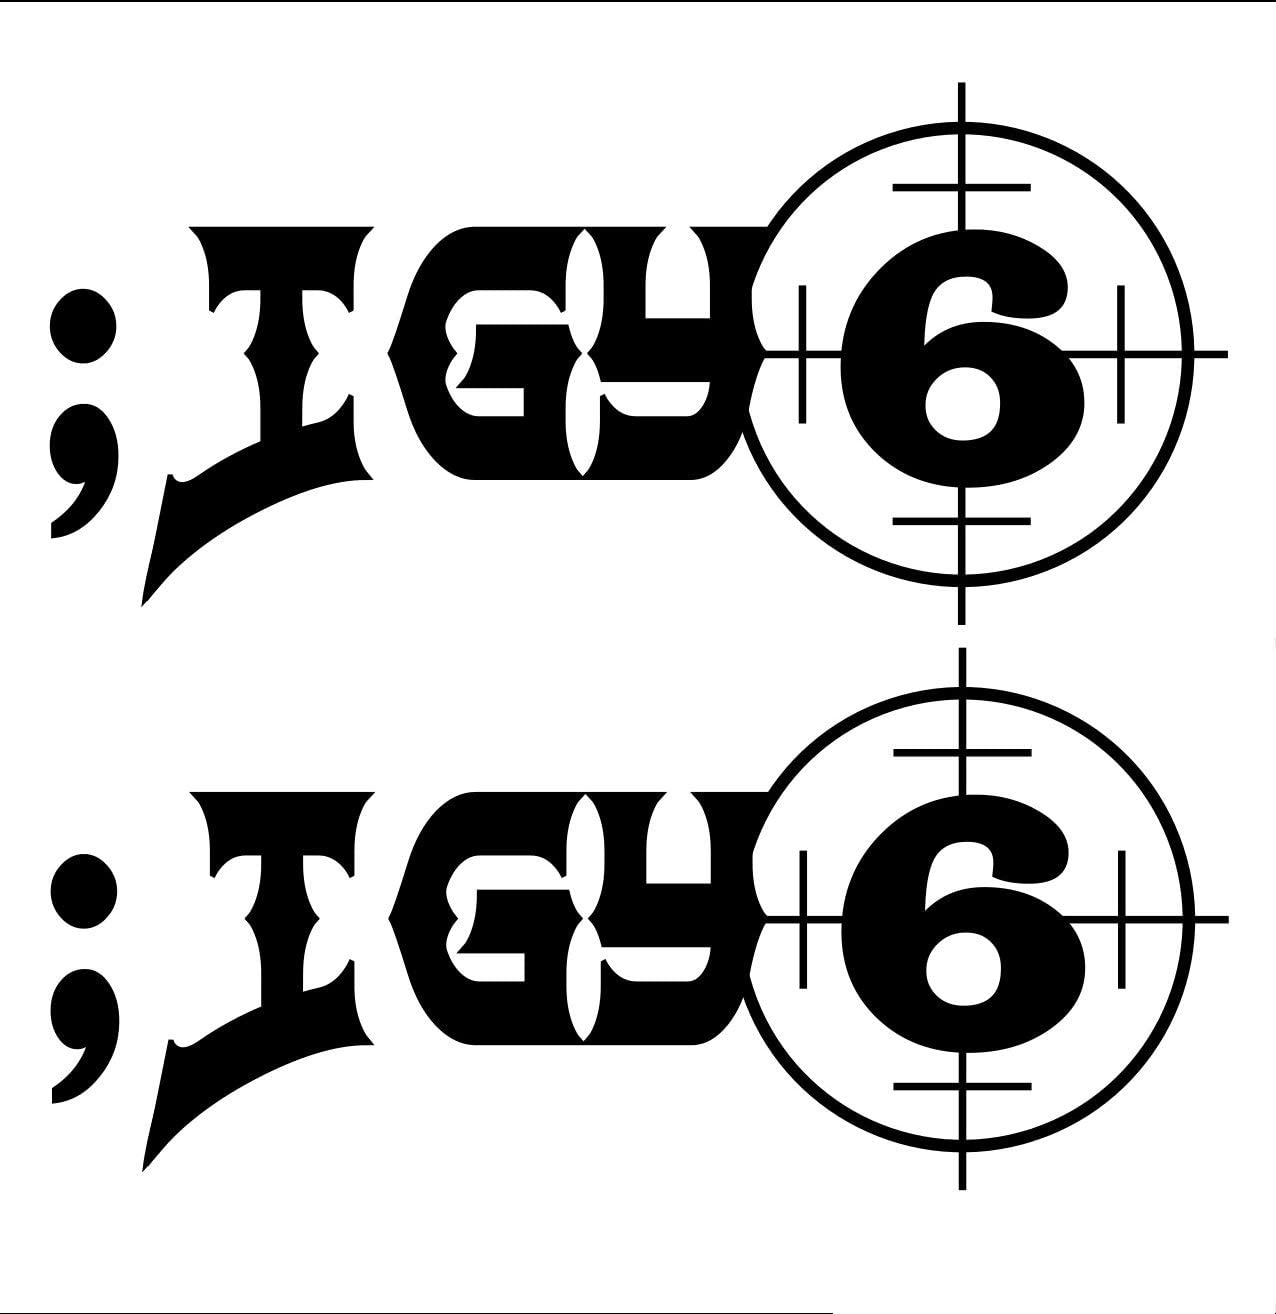 UR Impressions Blk ;IGY6 - I Got Your 6 2-Pack Decal Vinyl Sticker Graphics Car Truck SUV Van Wall Window Laptop Black 6 X 2.7 Inch URI620